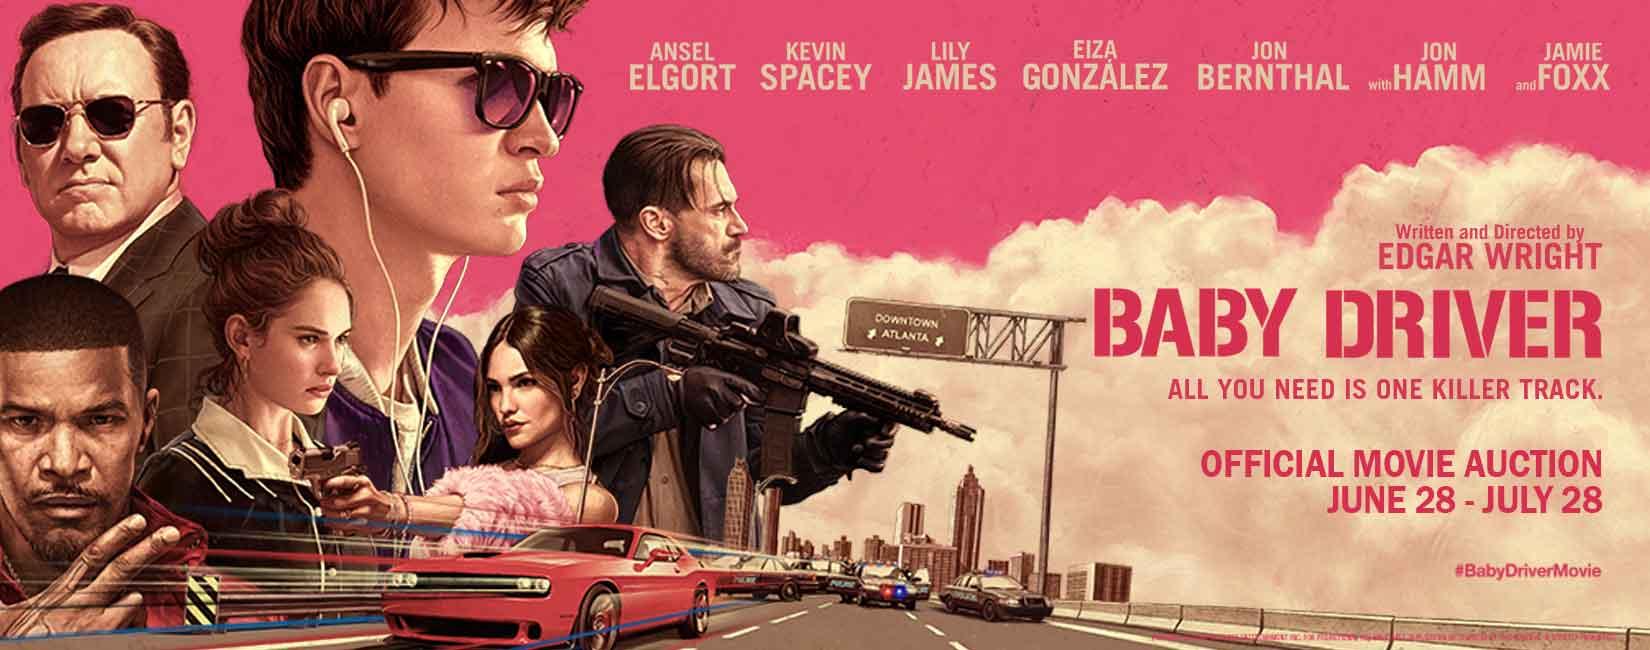 Kuvahaun tulos haulle baby driver film poster